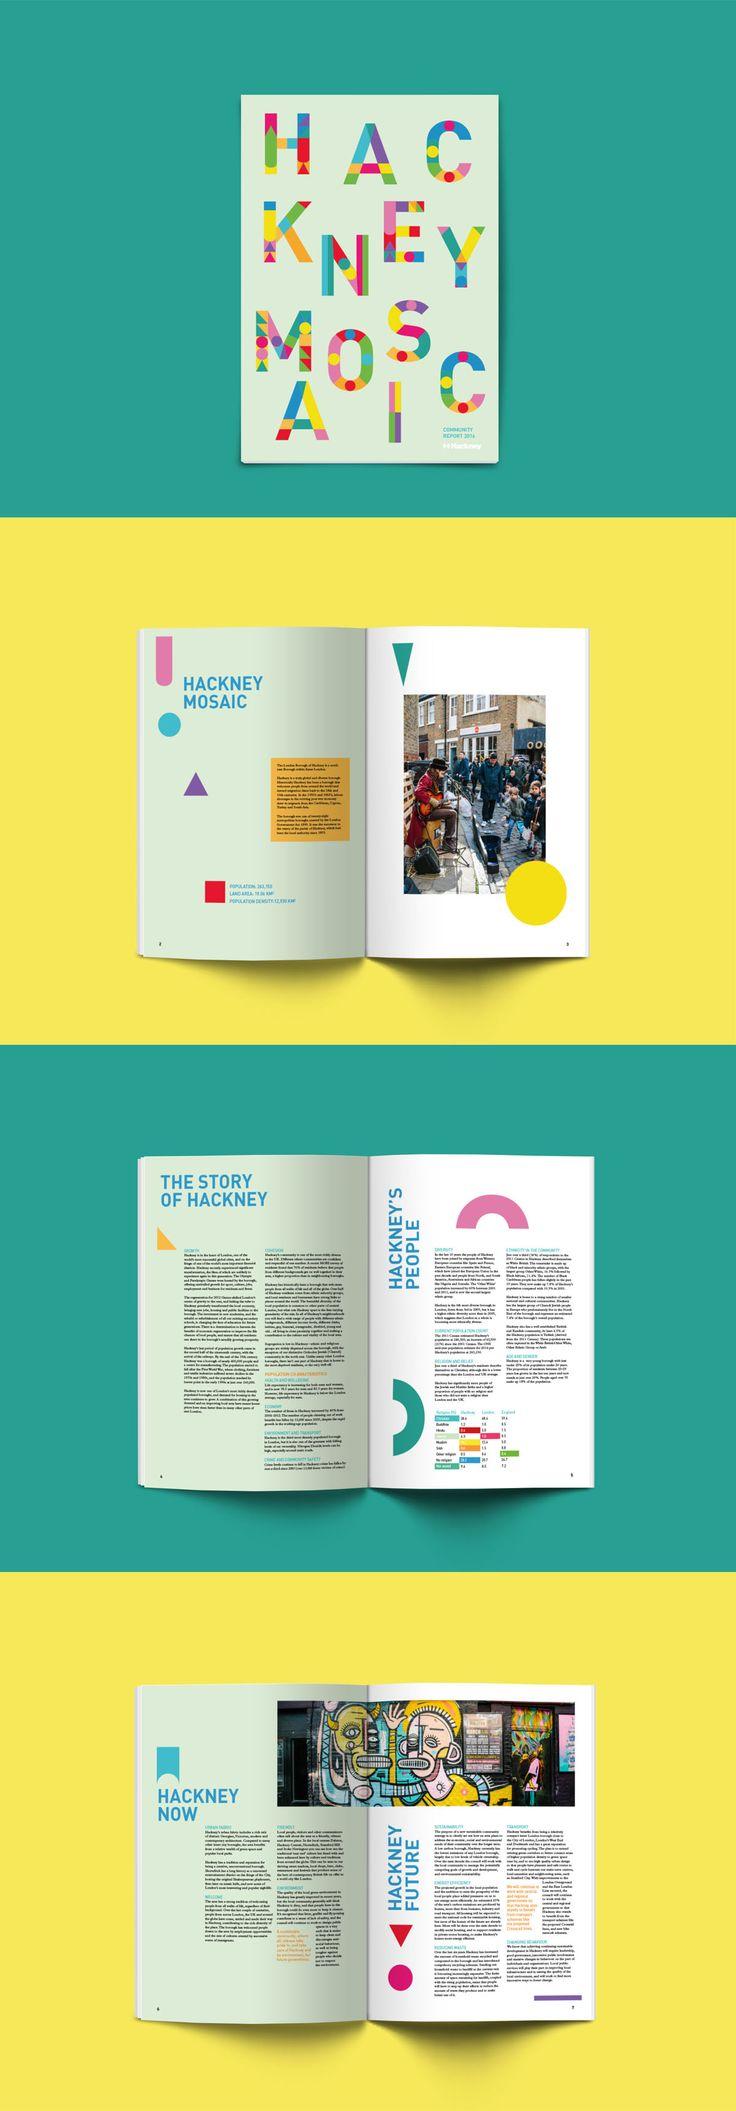 Report Design by Jack Slater, Shillington Graduate. More student work --> http://shillingtoncollege.co.uk/graphic-design-course/student-work #shillington #shillingtoneducation #graphicdesign #report